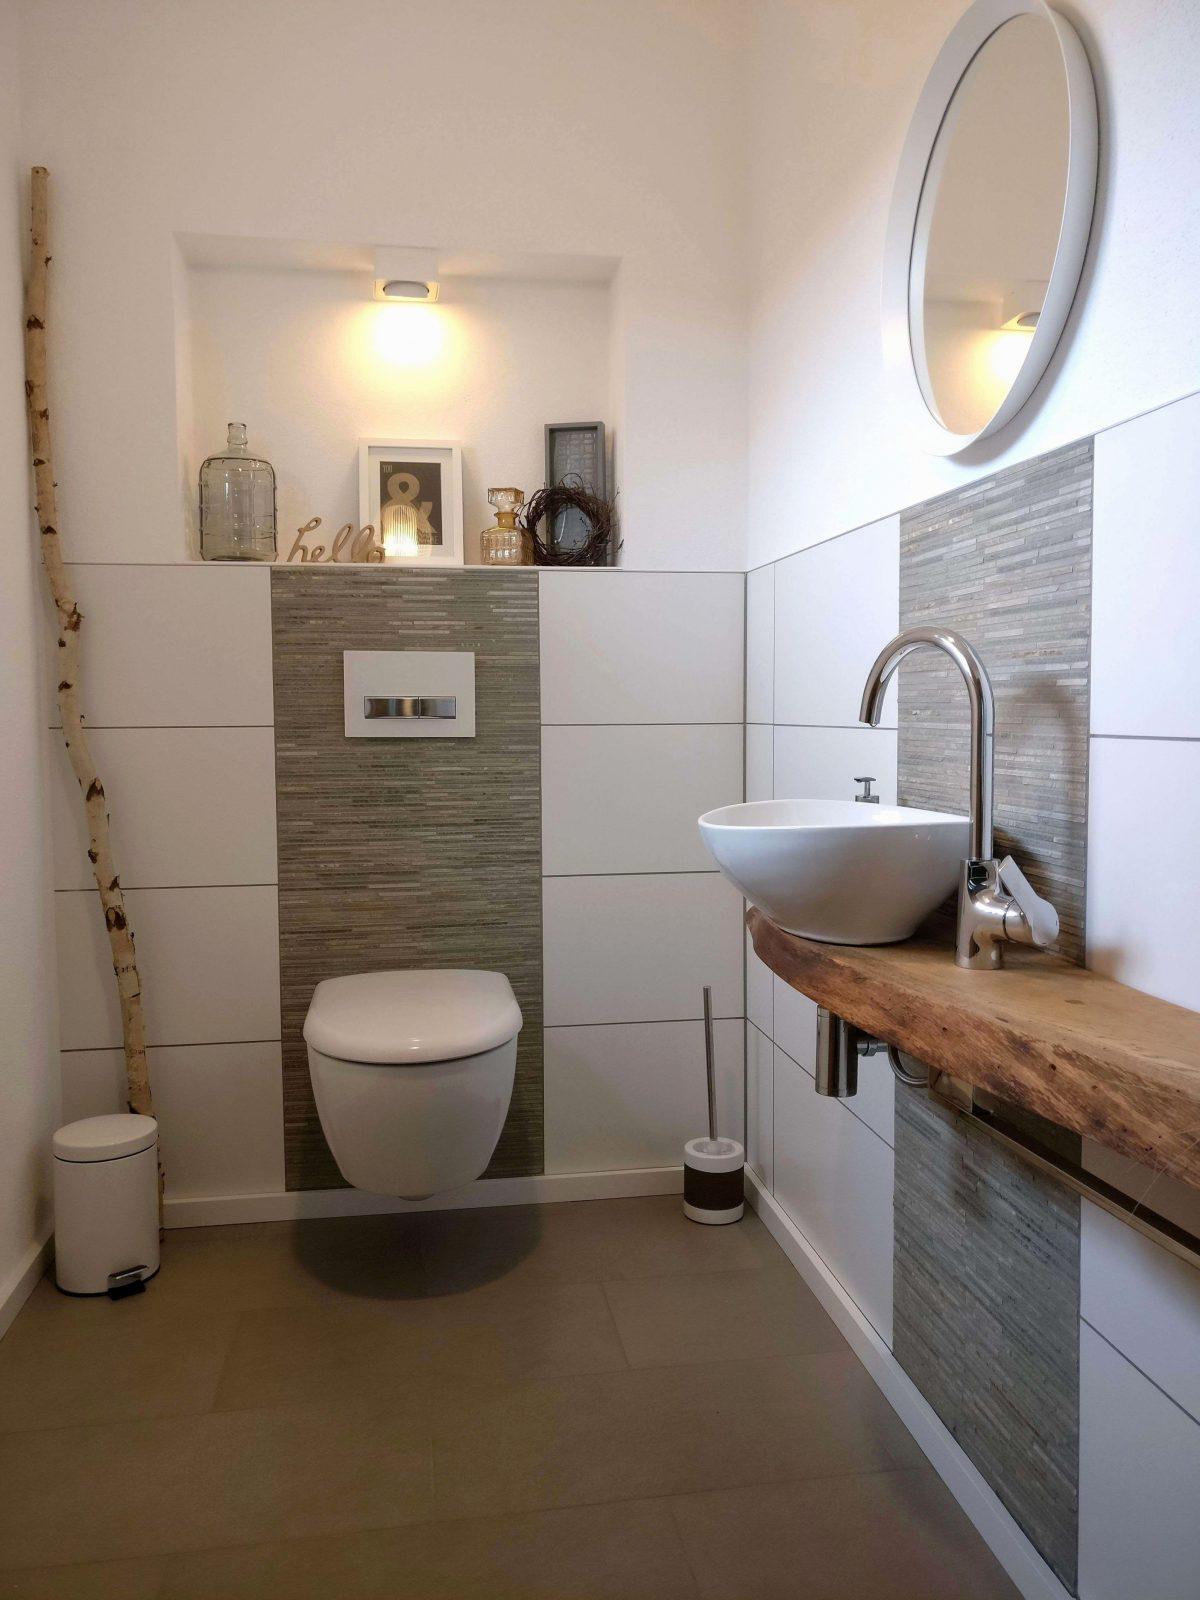 Kleines Bad Renovieren Ideen — Temobardz Home Blog von Kleines Bad Renovieren Ideen Bild